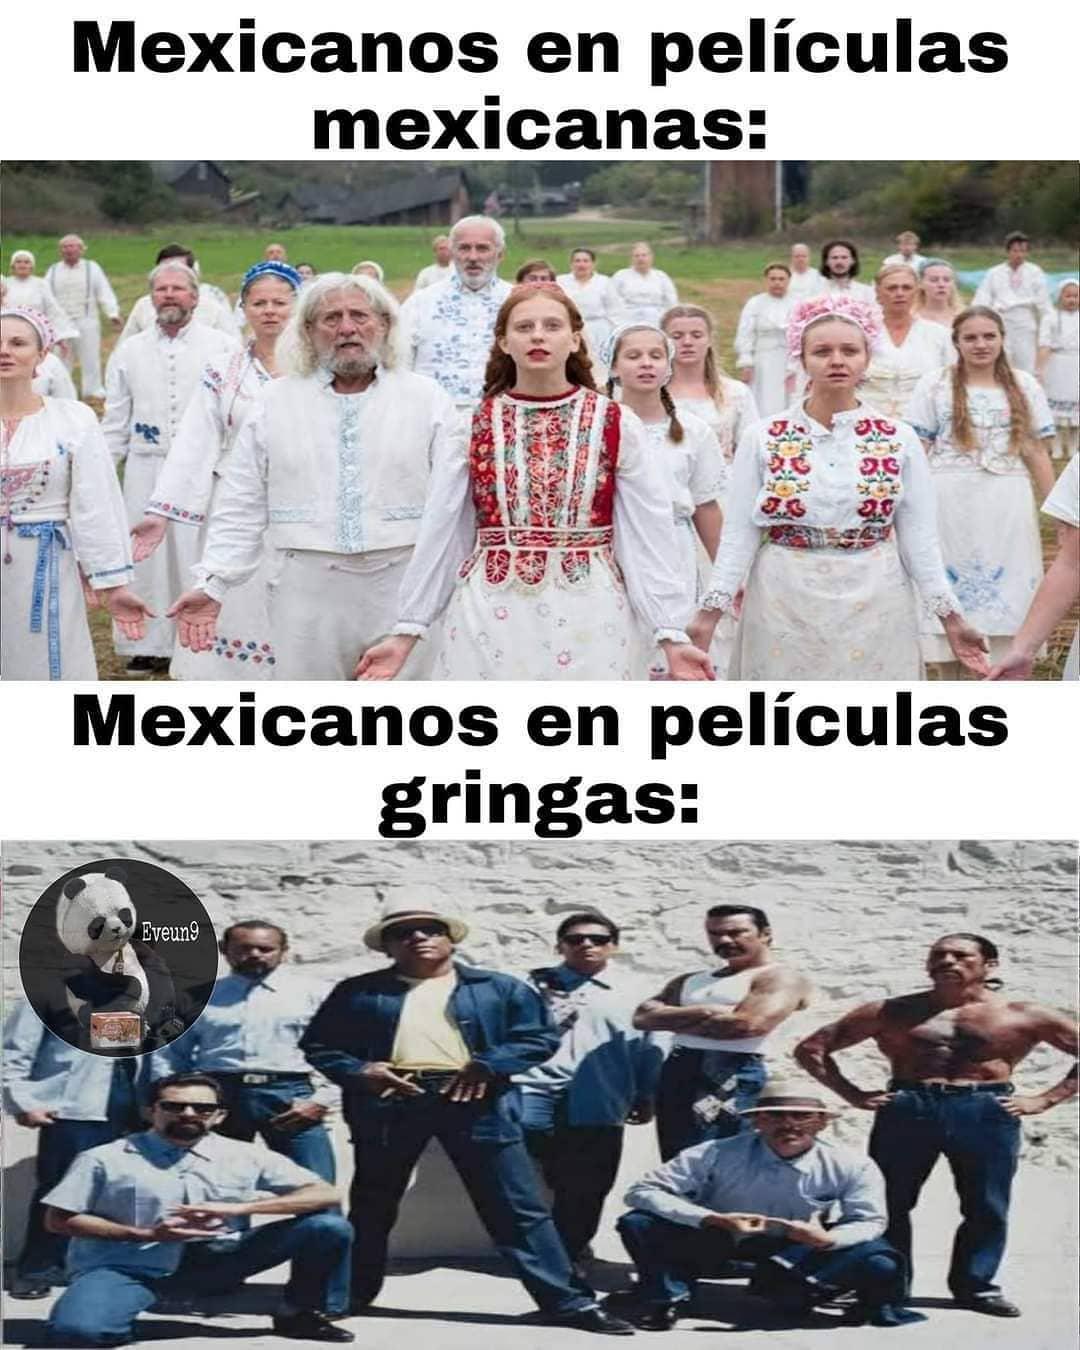 Mexicanos en películas mexicanas:  Mexicanos en películas gringas: